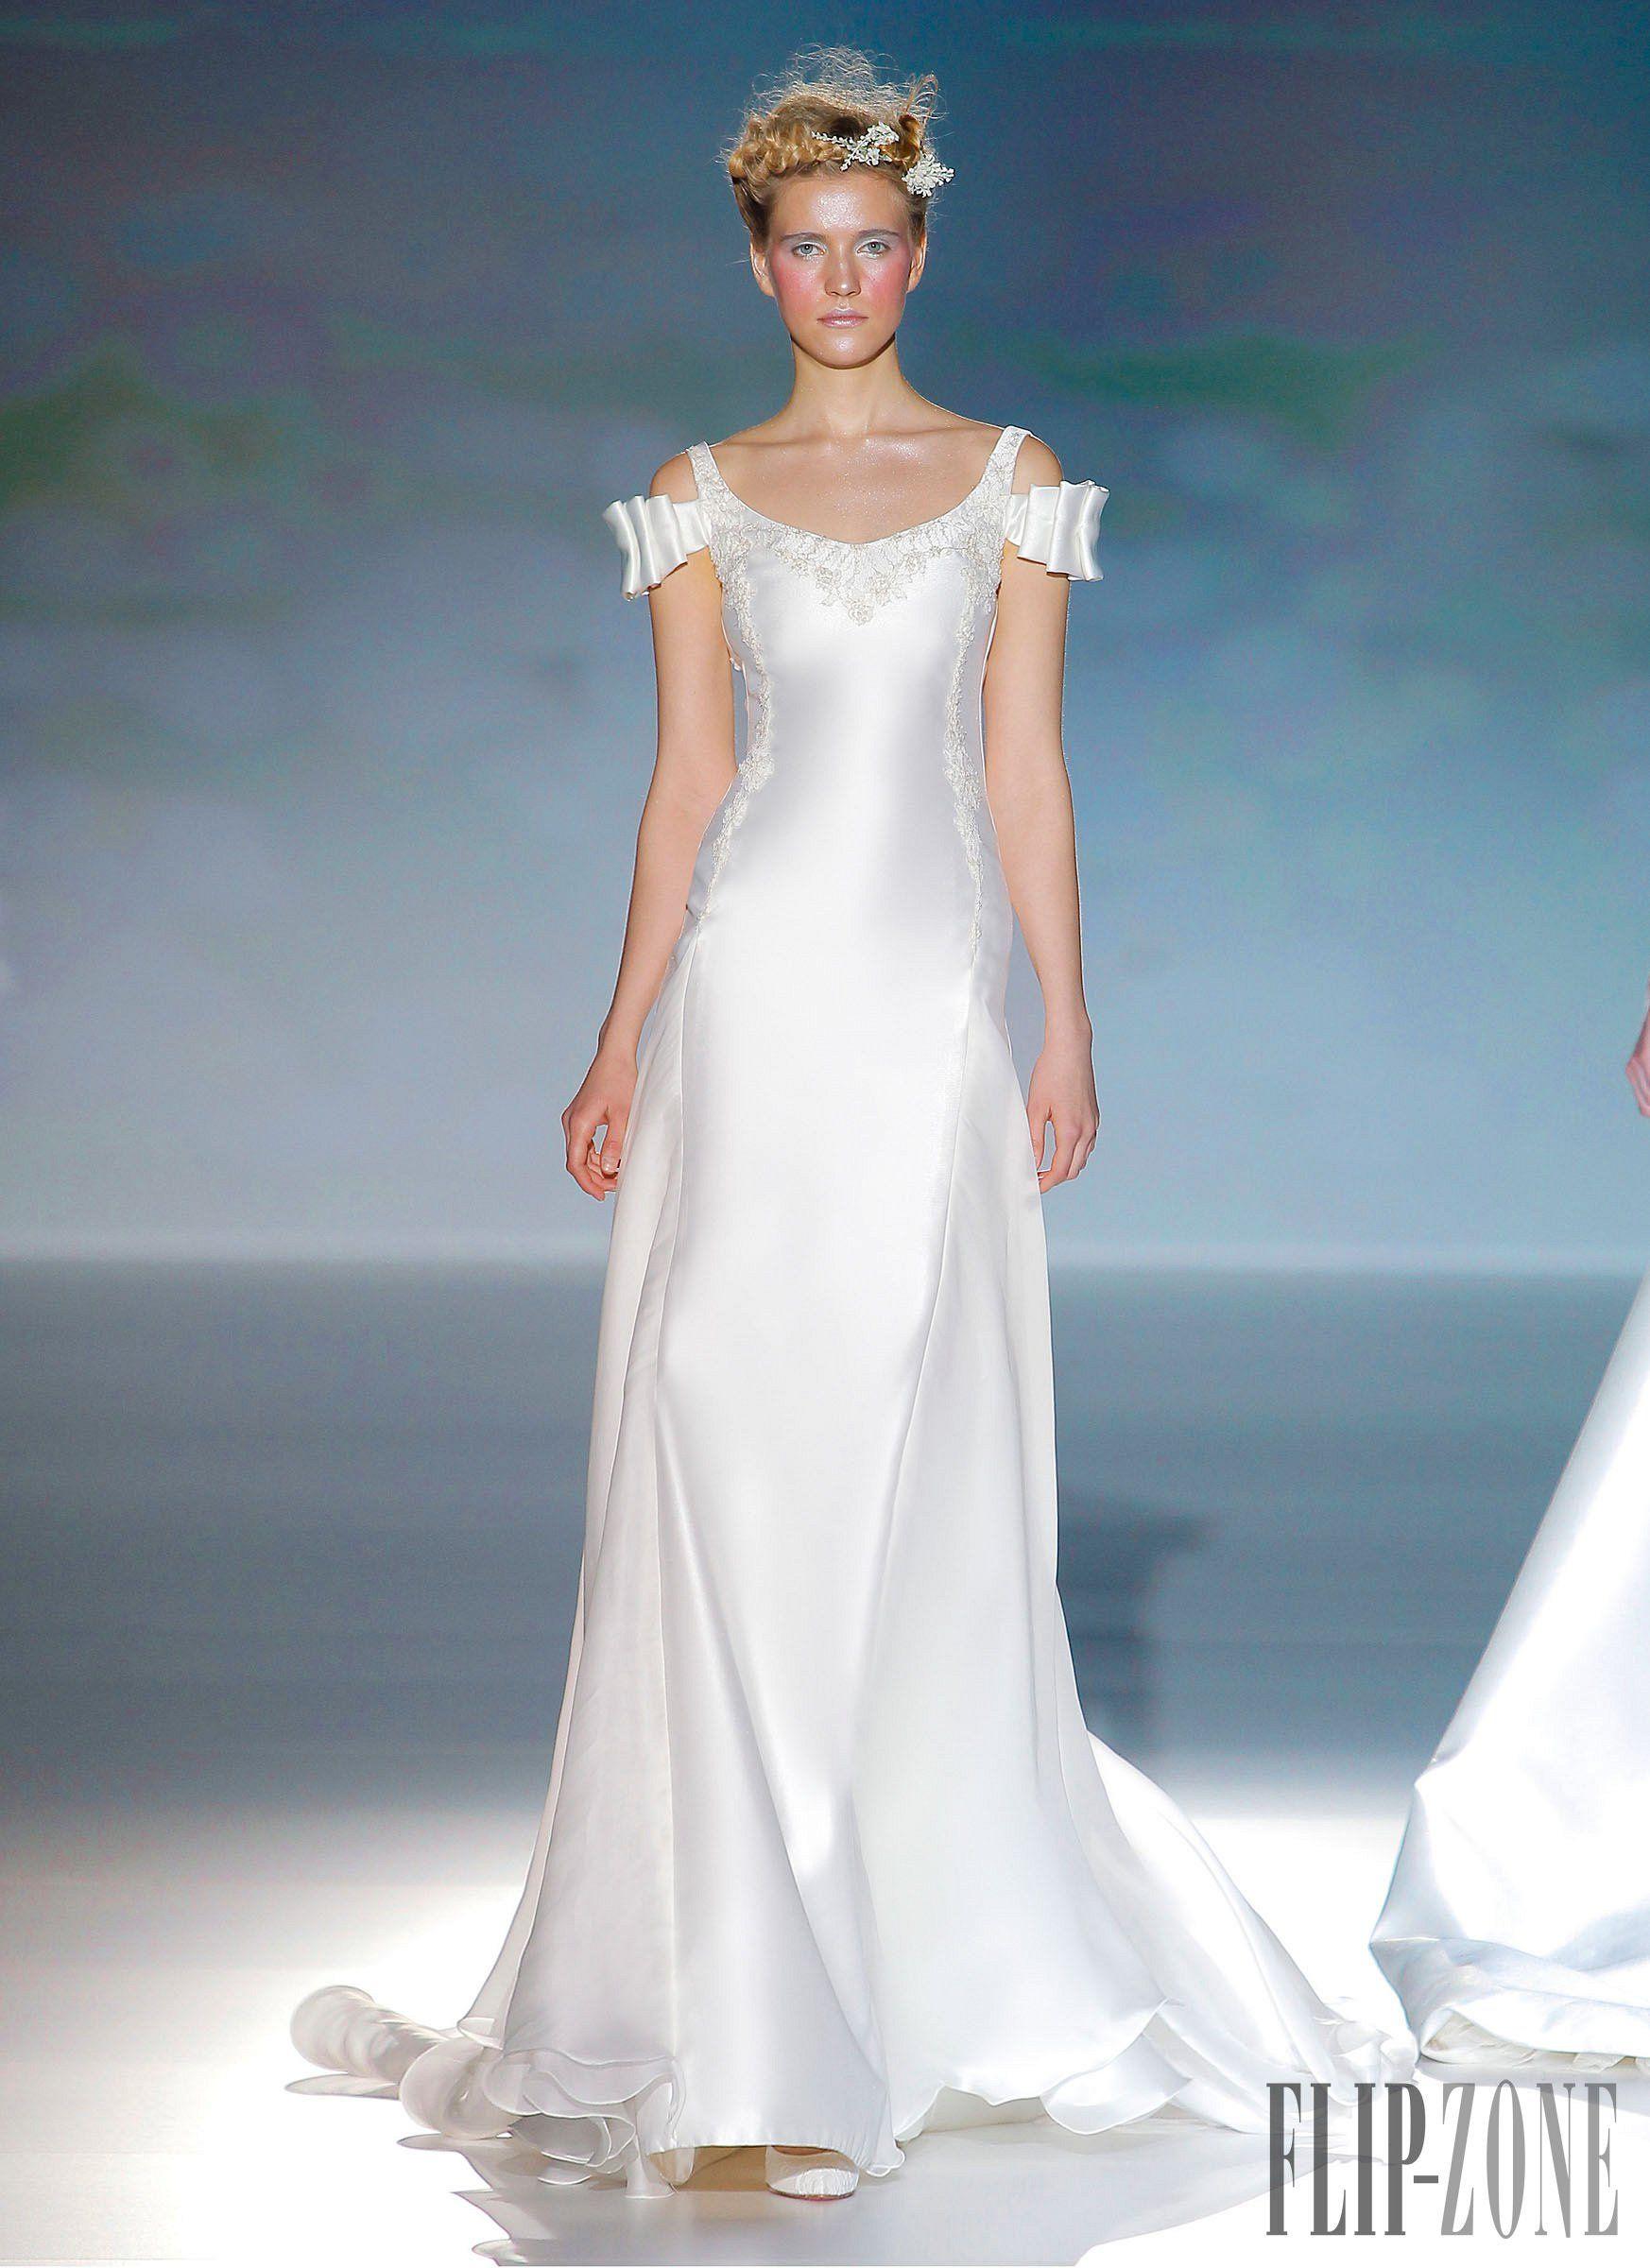 Victorio & Lucchino 2014 collection - Bridal | wedding dresses ...